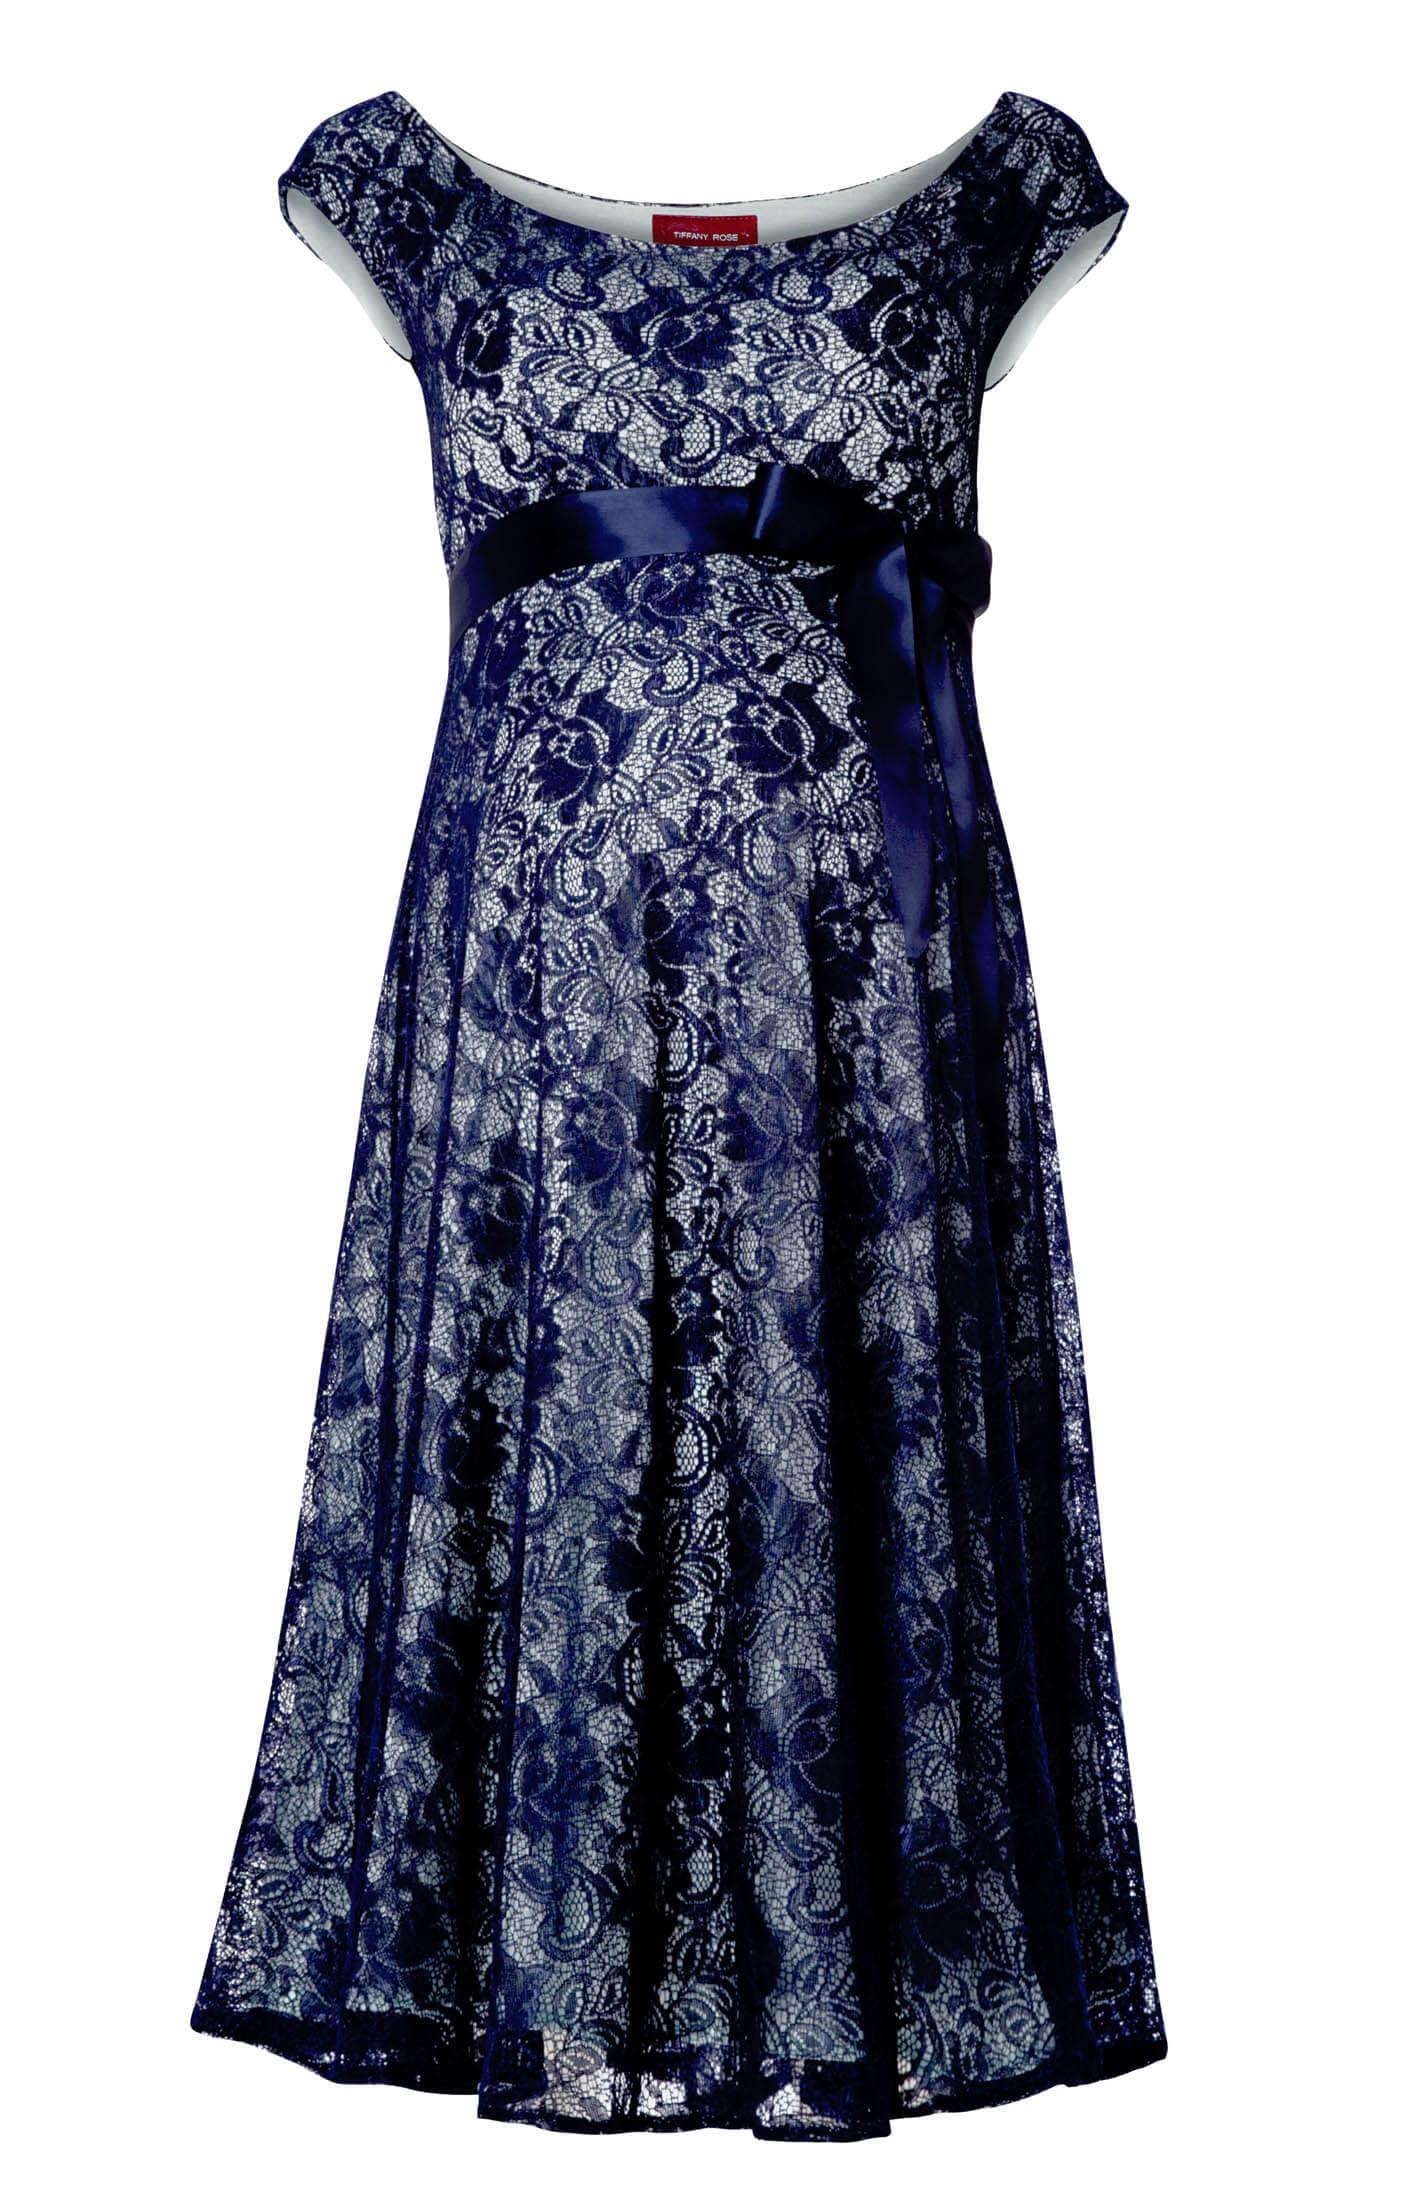 Eliza Maternity Dress Short Aqua Marine Maternity Wedding Dresses Evening Wear And Party Clothes By Tiffany Rose Us